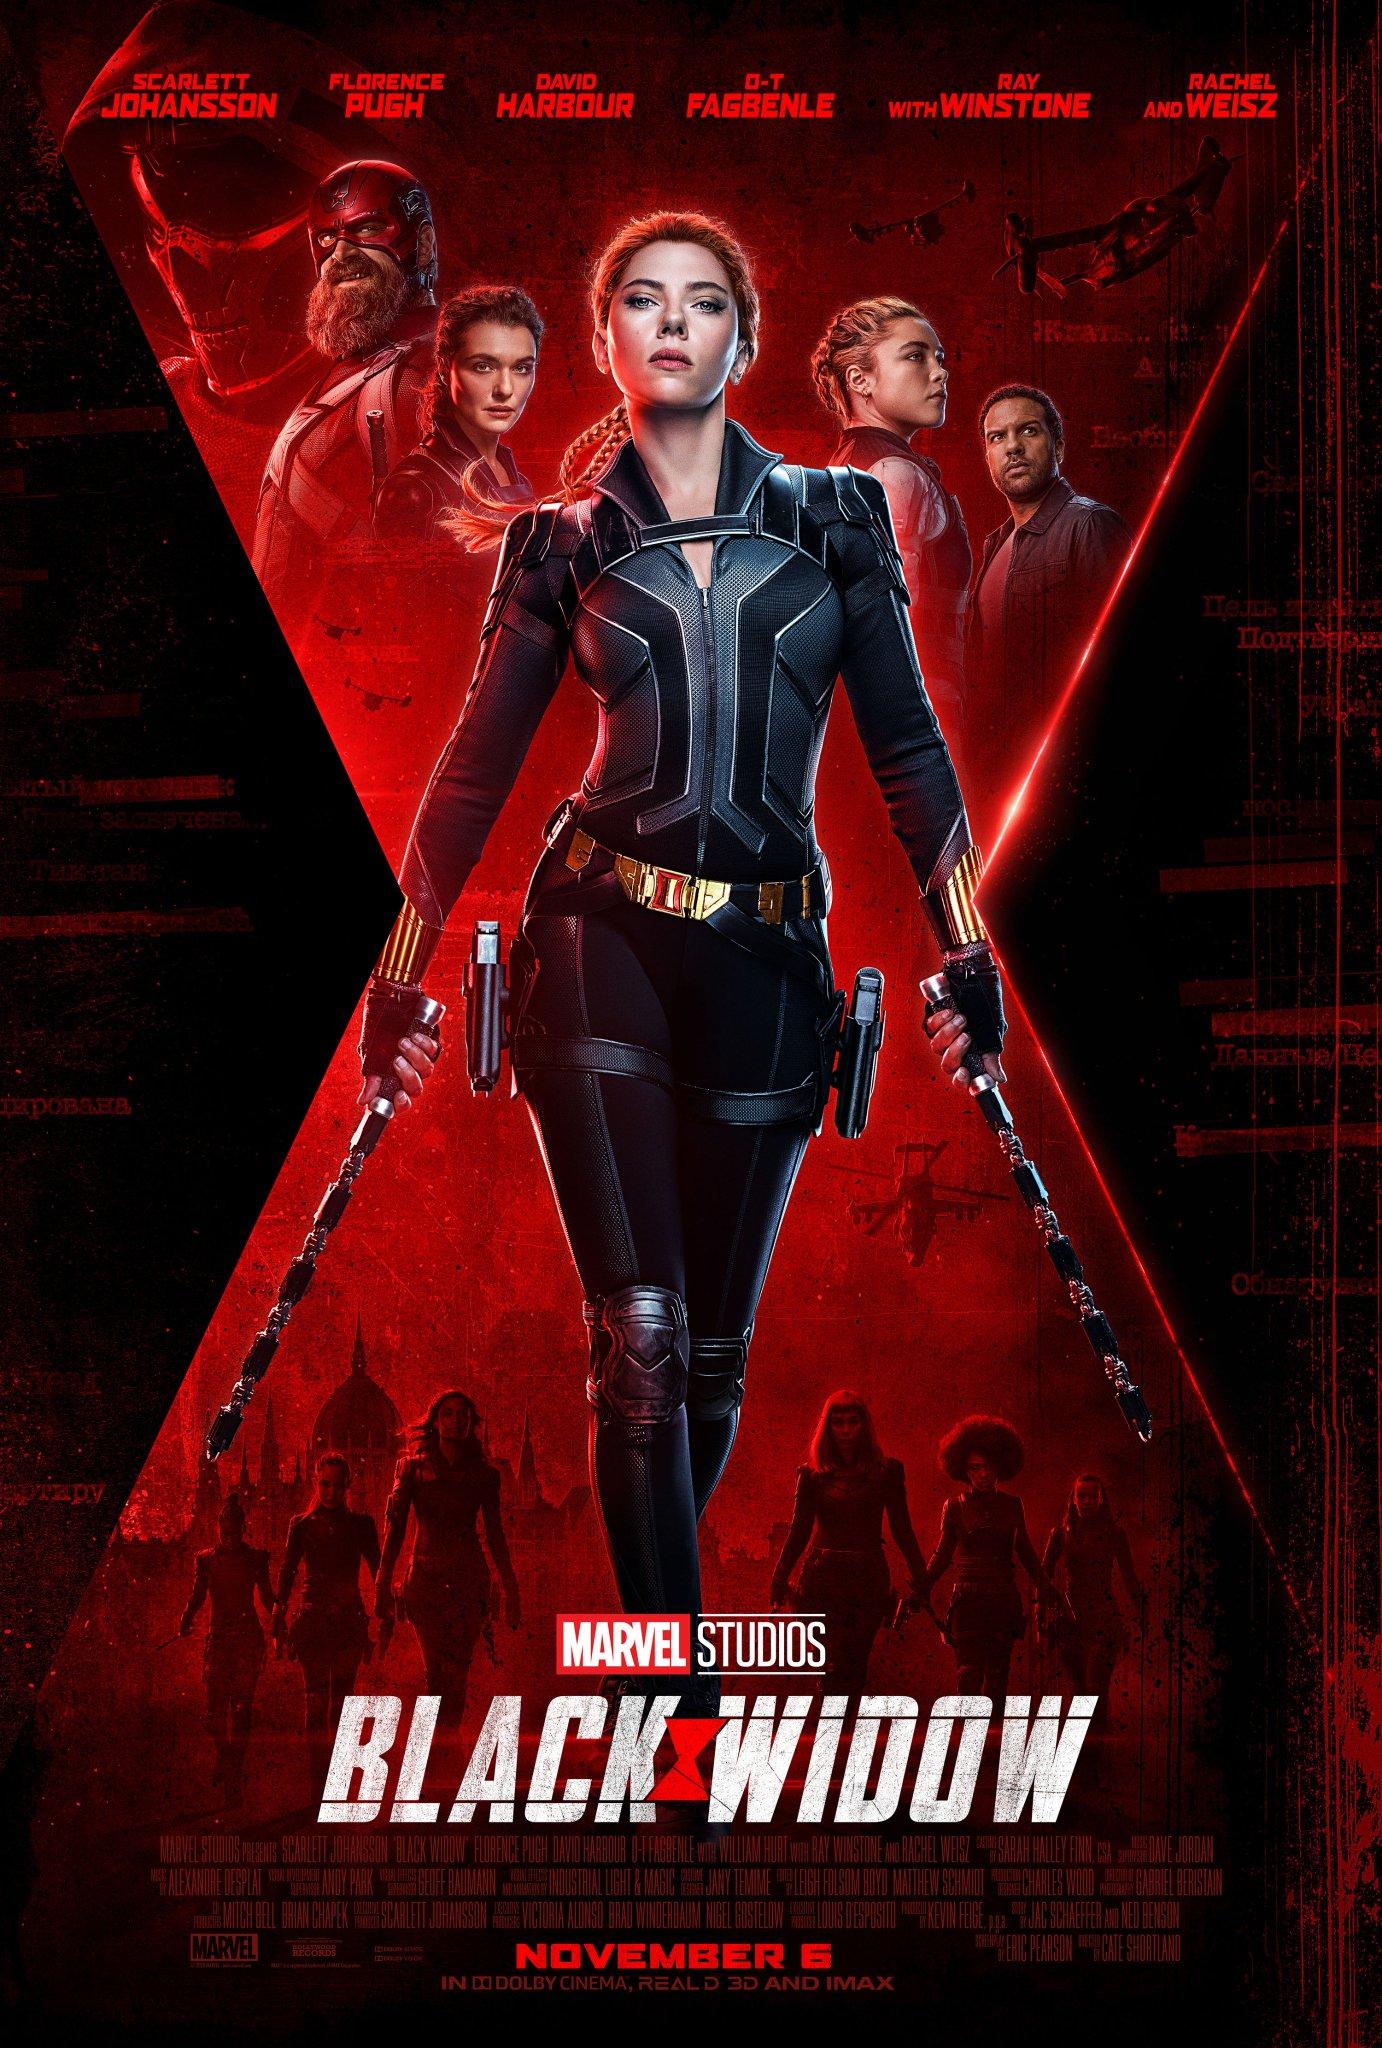 Black Widow (film) poster 008.jpg